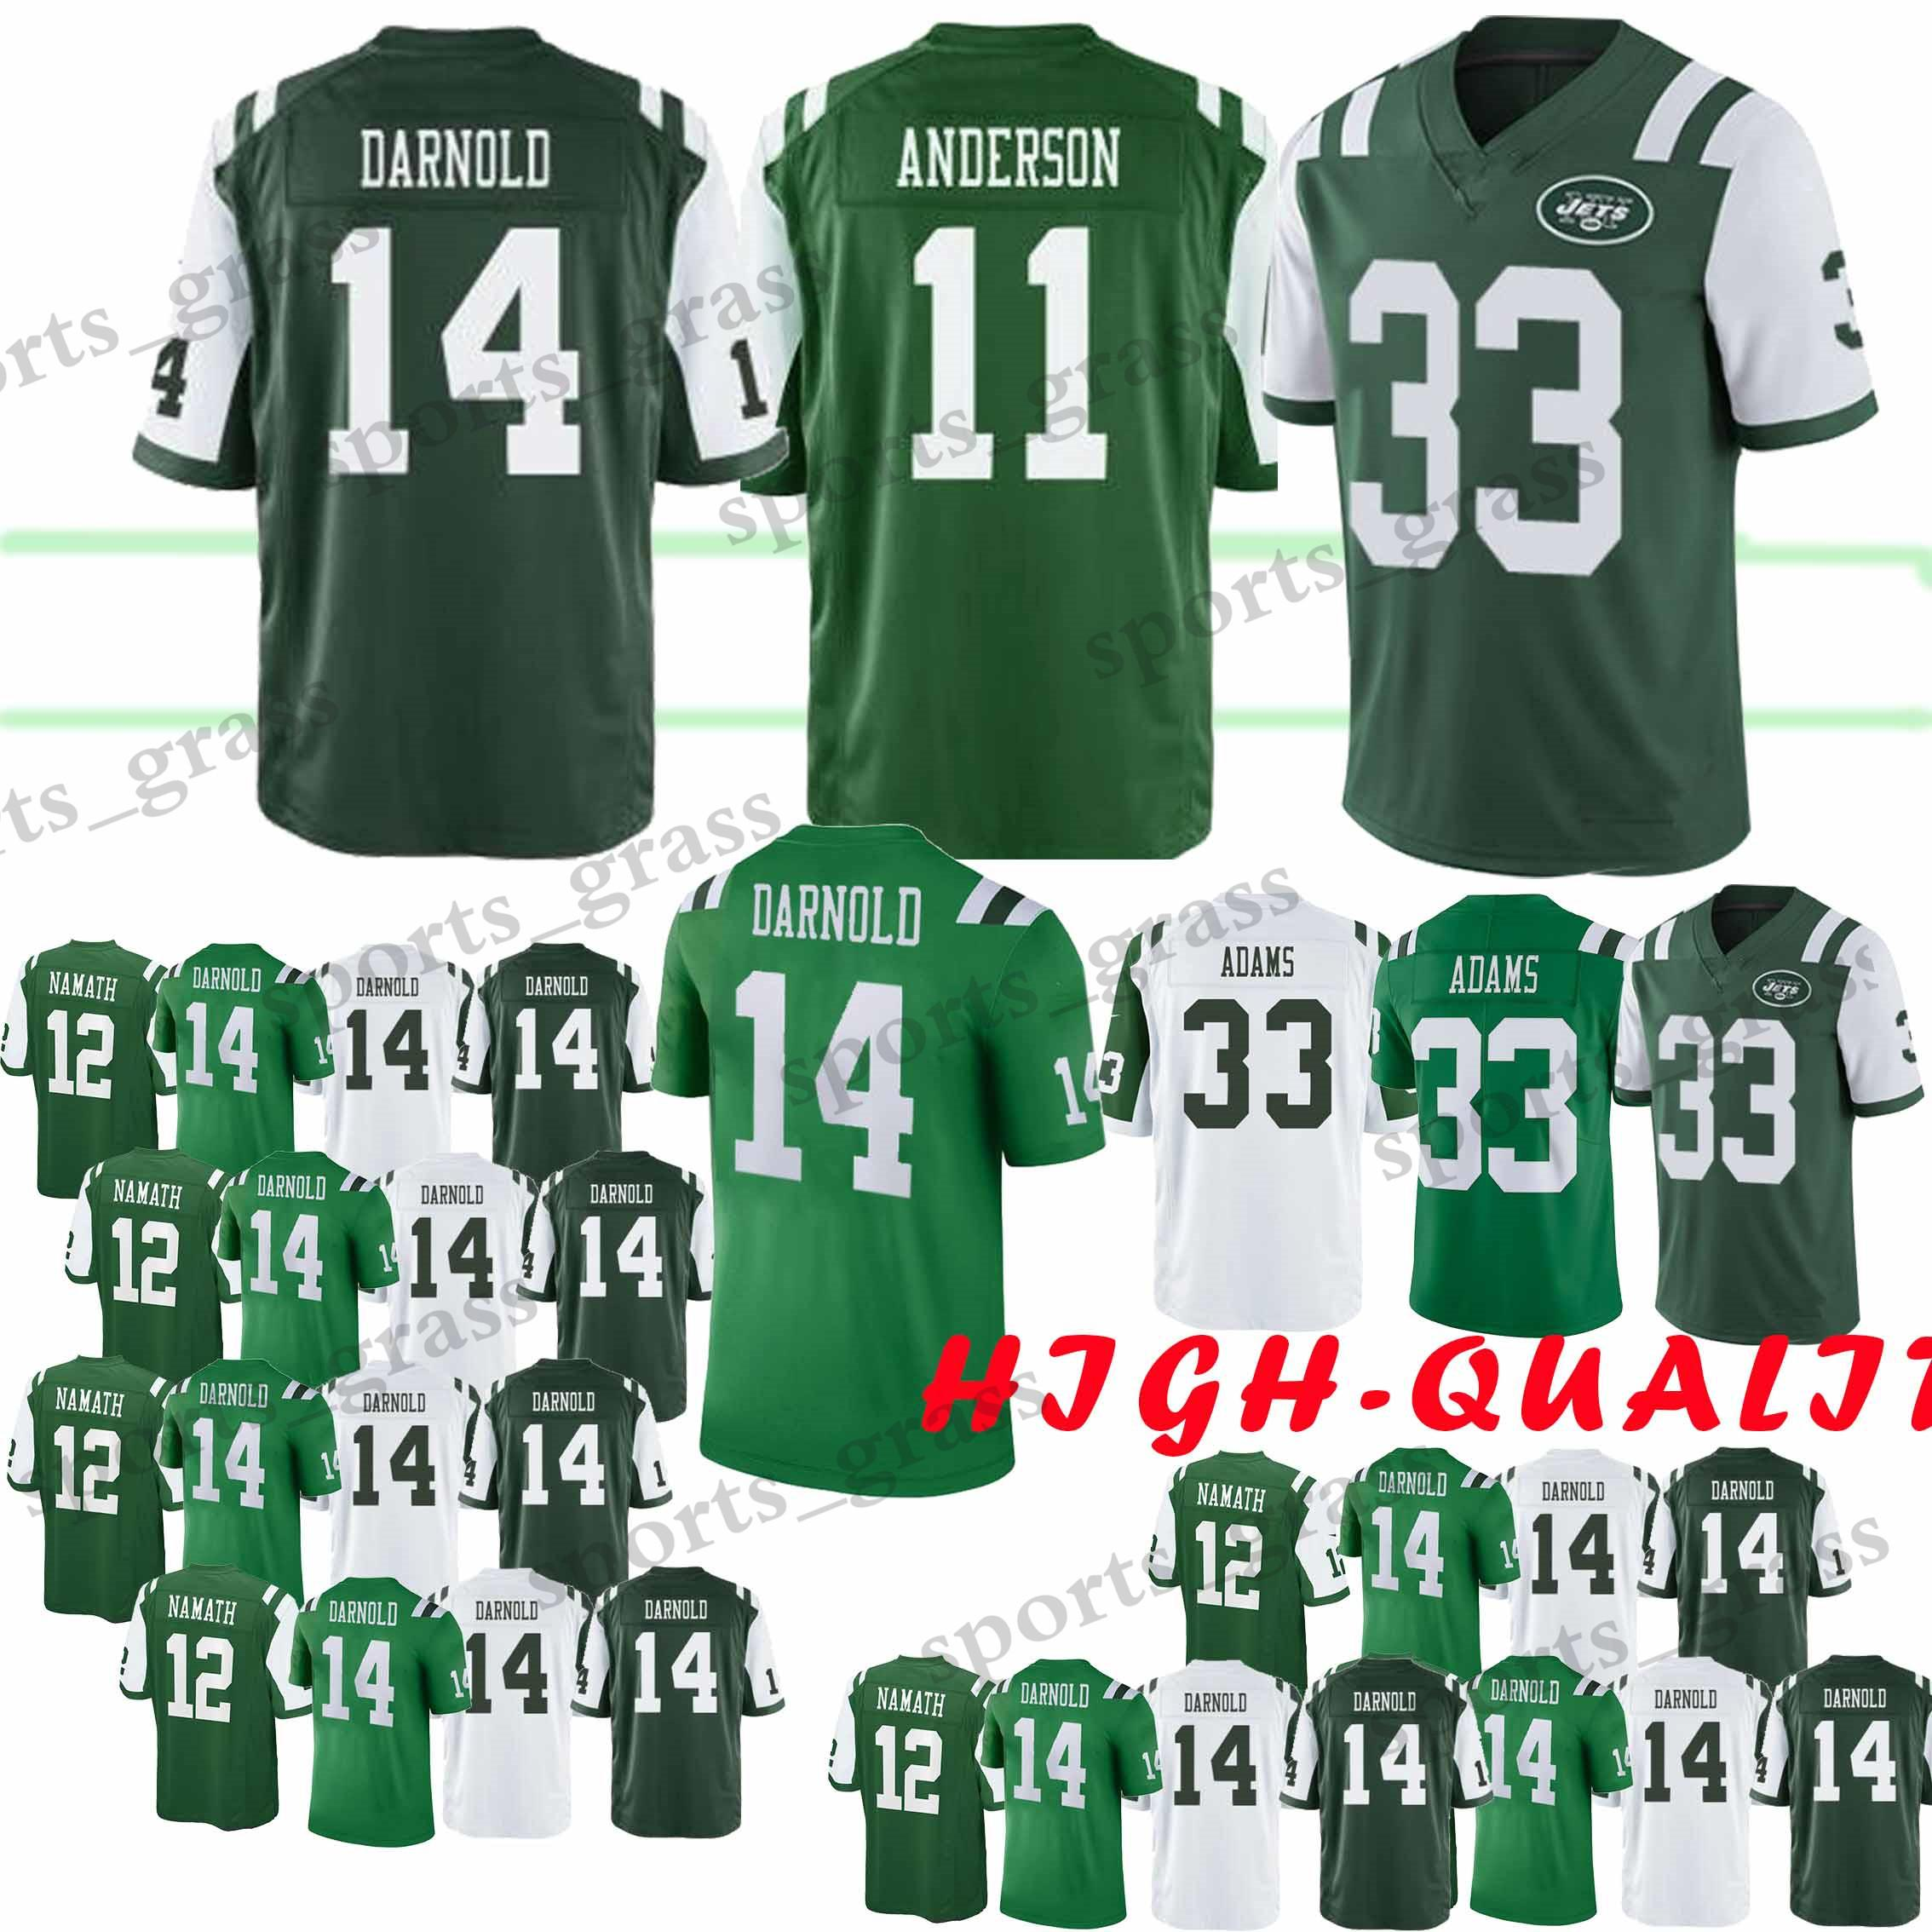 8b53e0ff57b 14 Sam Darnold New 11 Robby Anderson York Jets Jersey 33 Jamal Adams ...